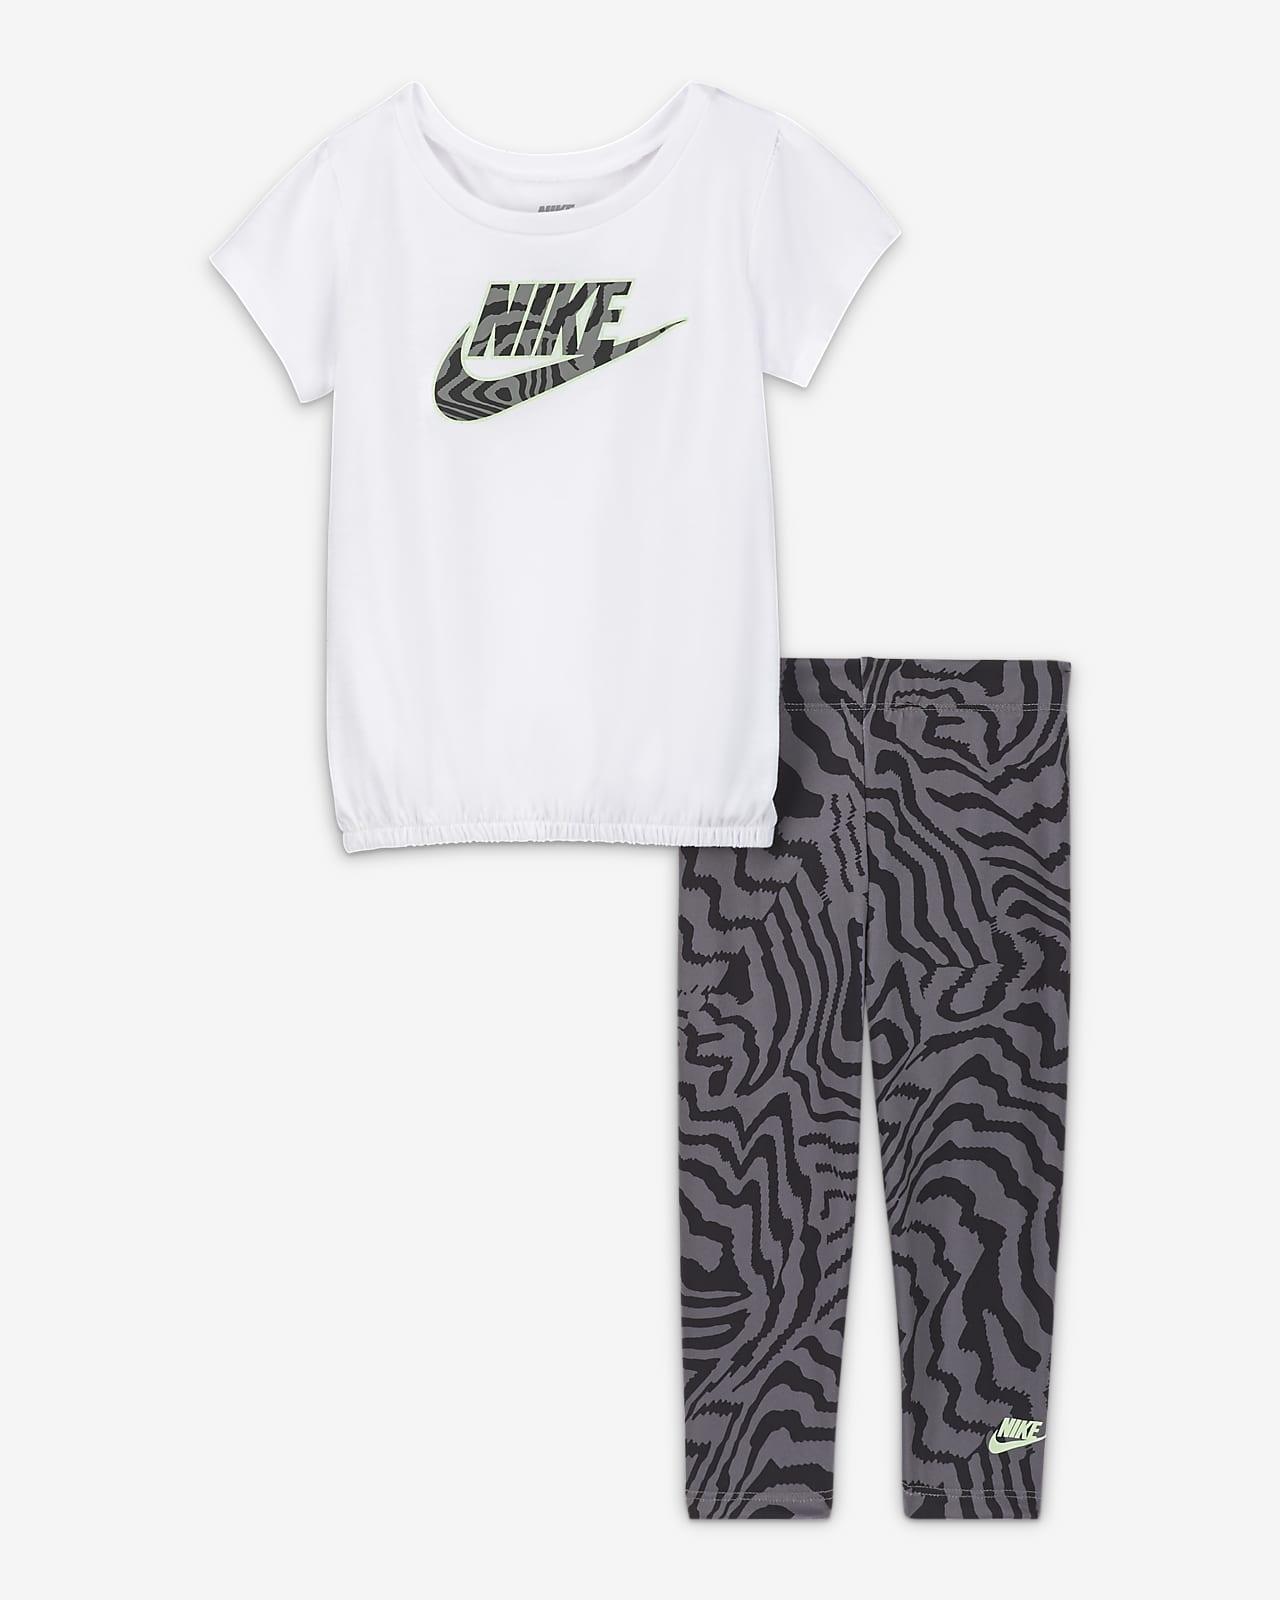 Nike-sæt med overdel og leggings med print til babyer (12-24 M)